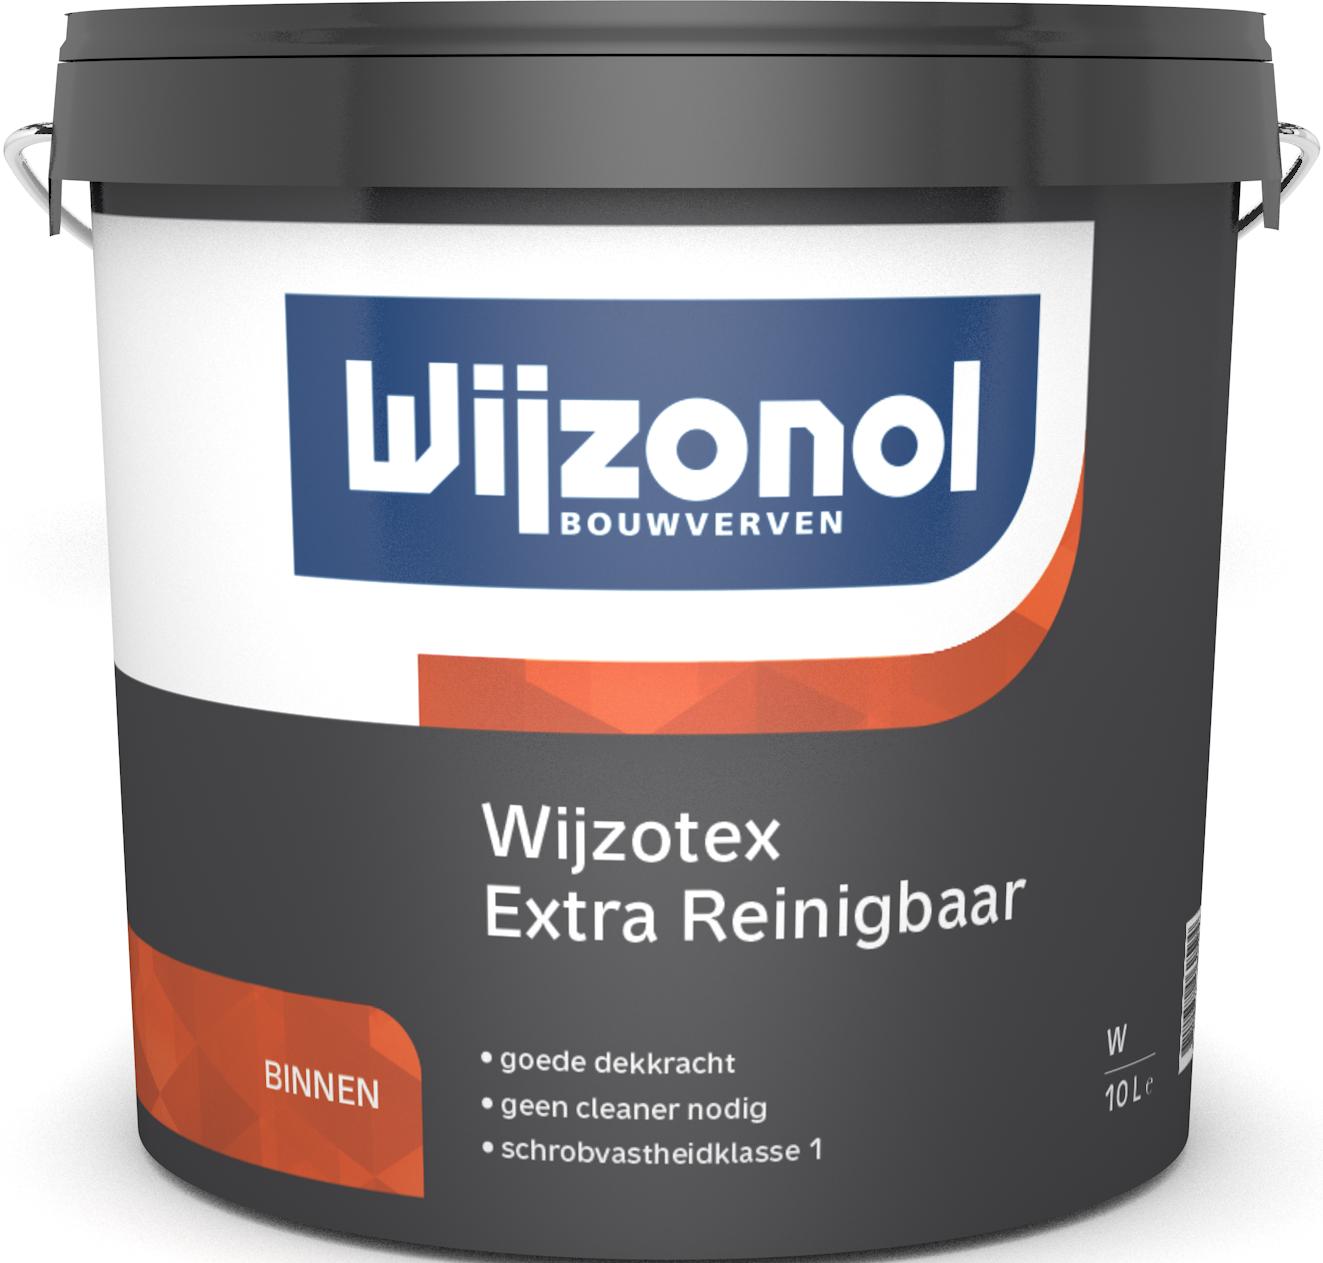 Wijzotex Extra Reinigbaar 10 Liter 100% Wit